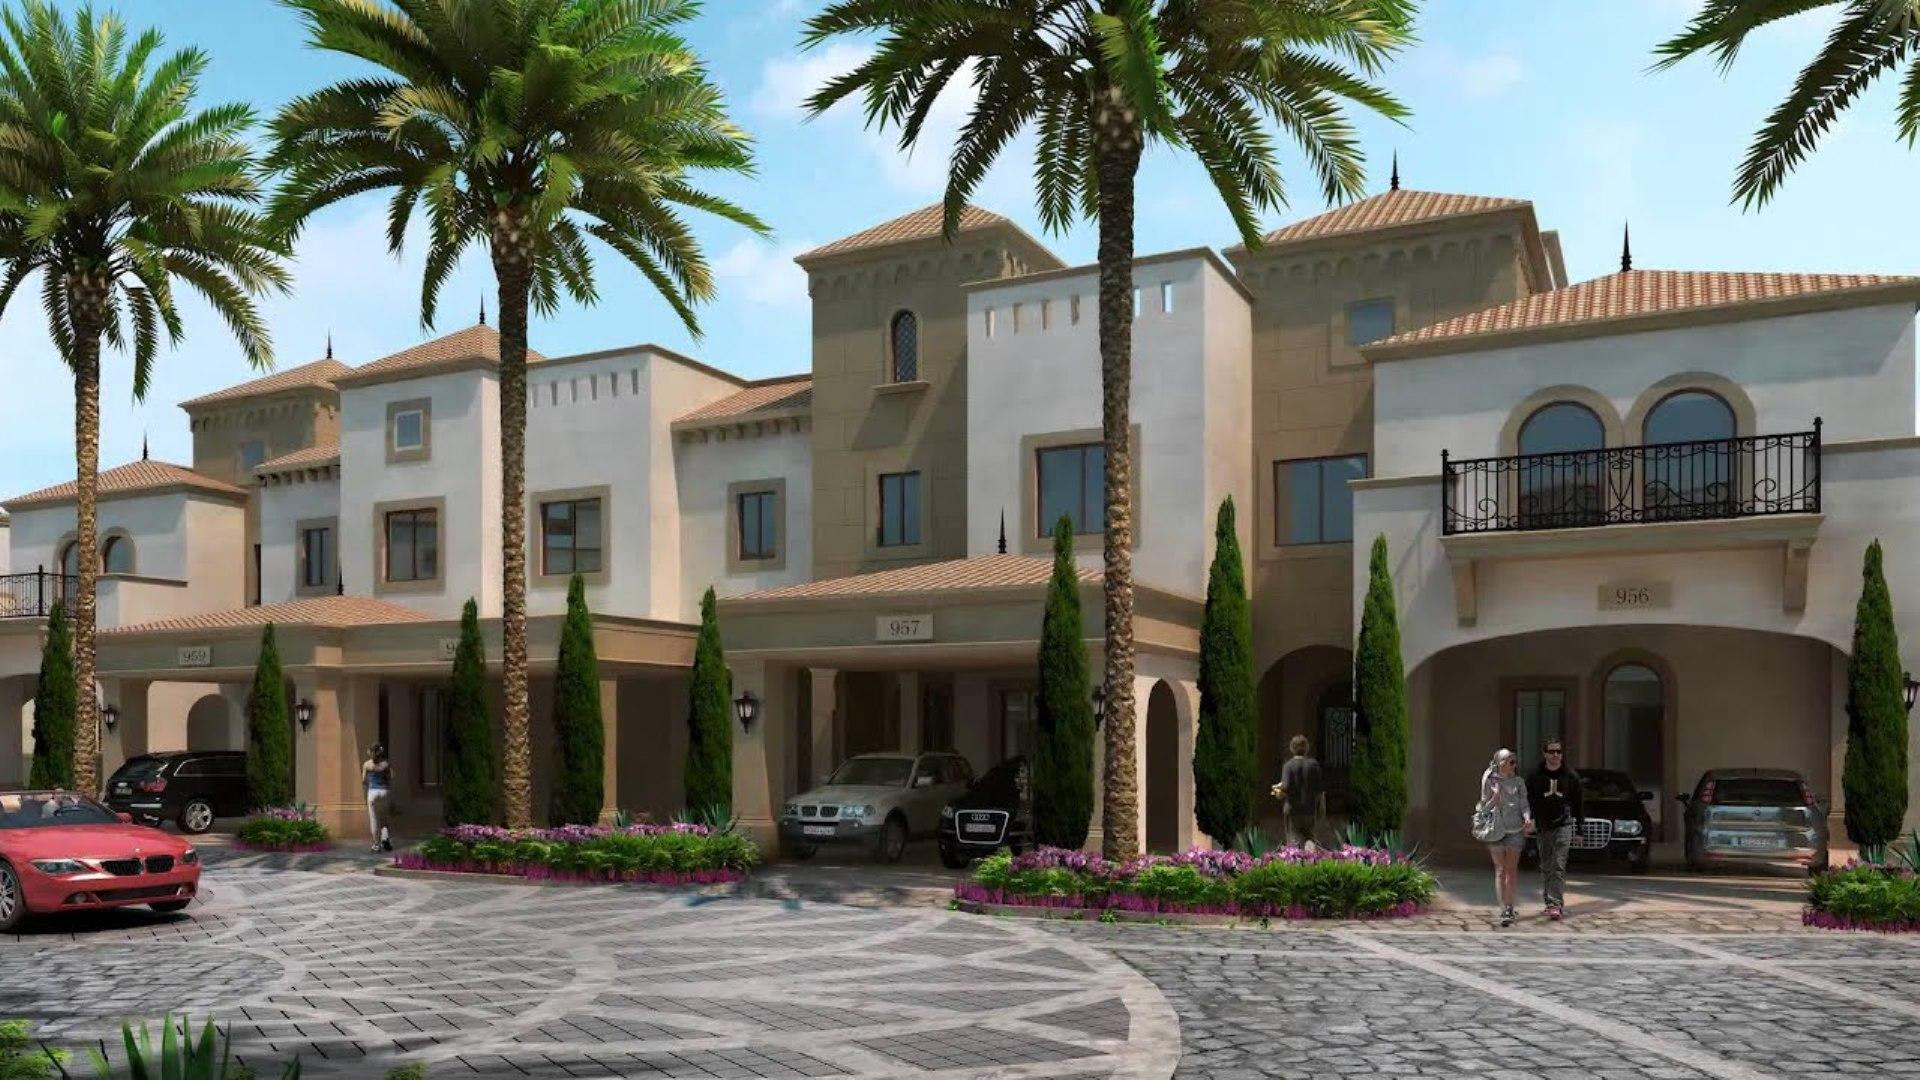 ALANDALUS, Jumeirah Golf Estates, Dubai, UAE – photo 7